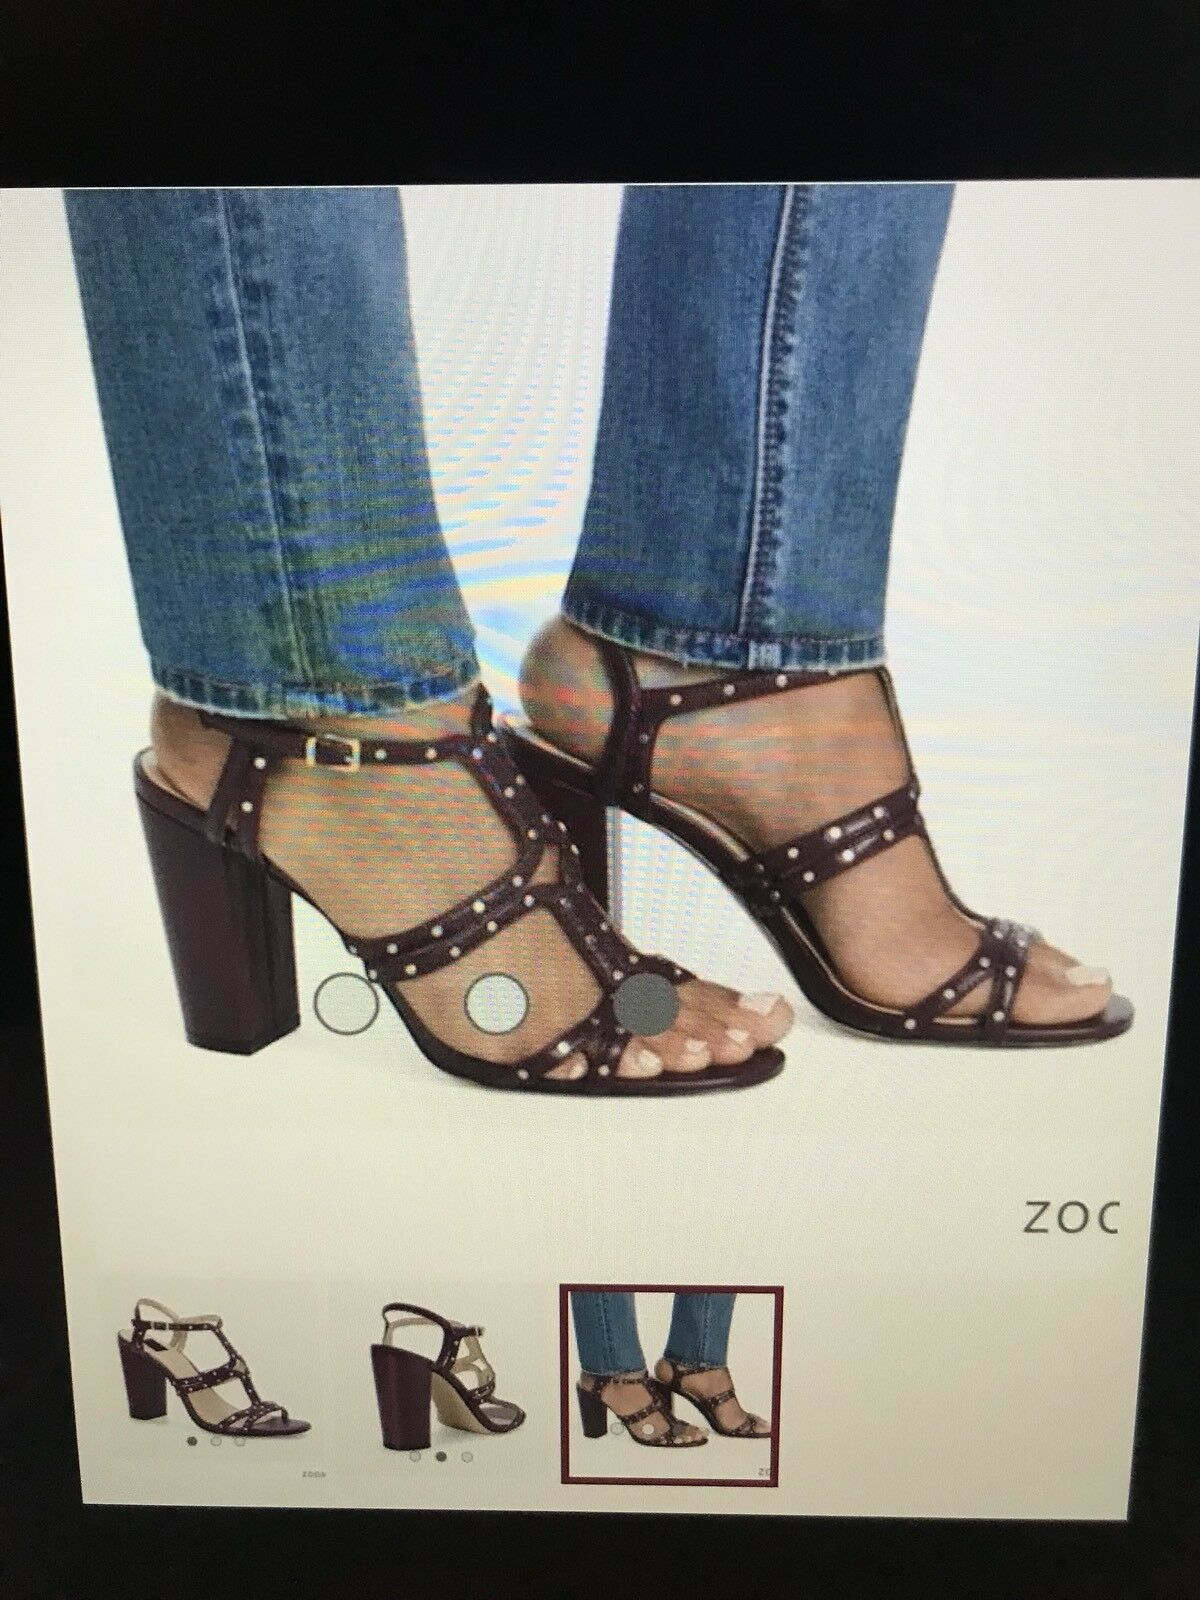 White House Black Market Women's Polly Studded Heels Sandals Studded Purple 8.5M